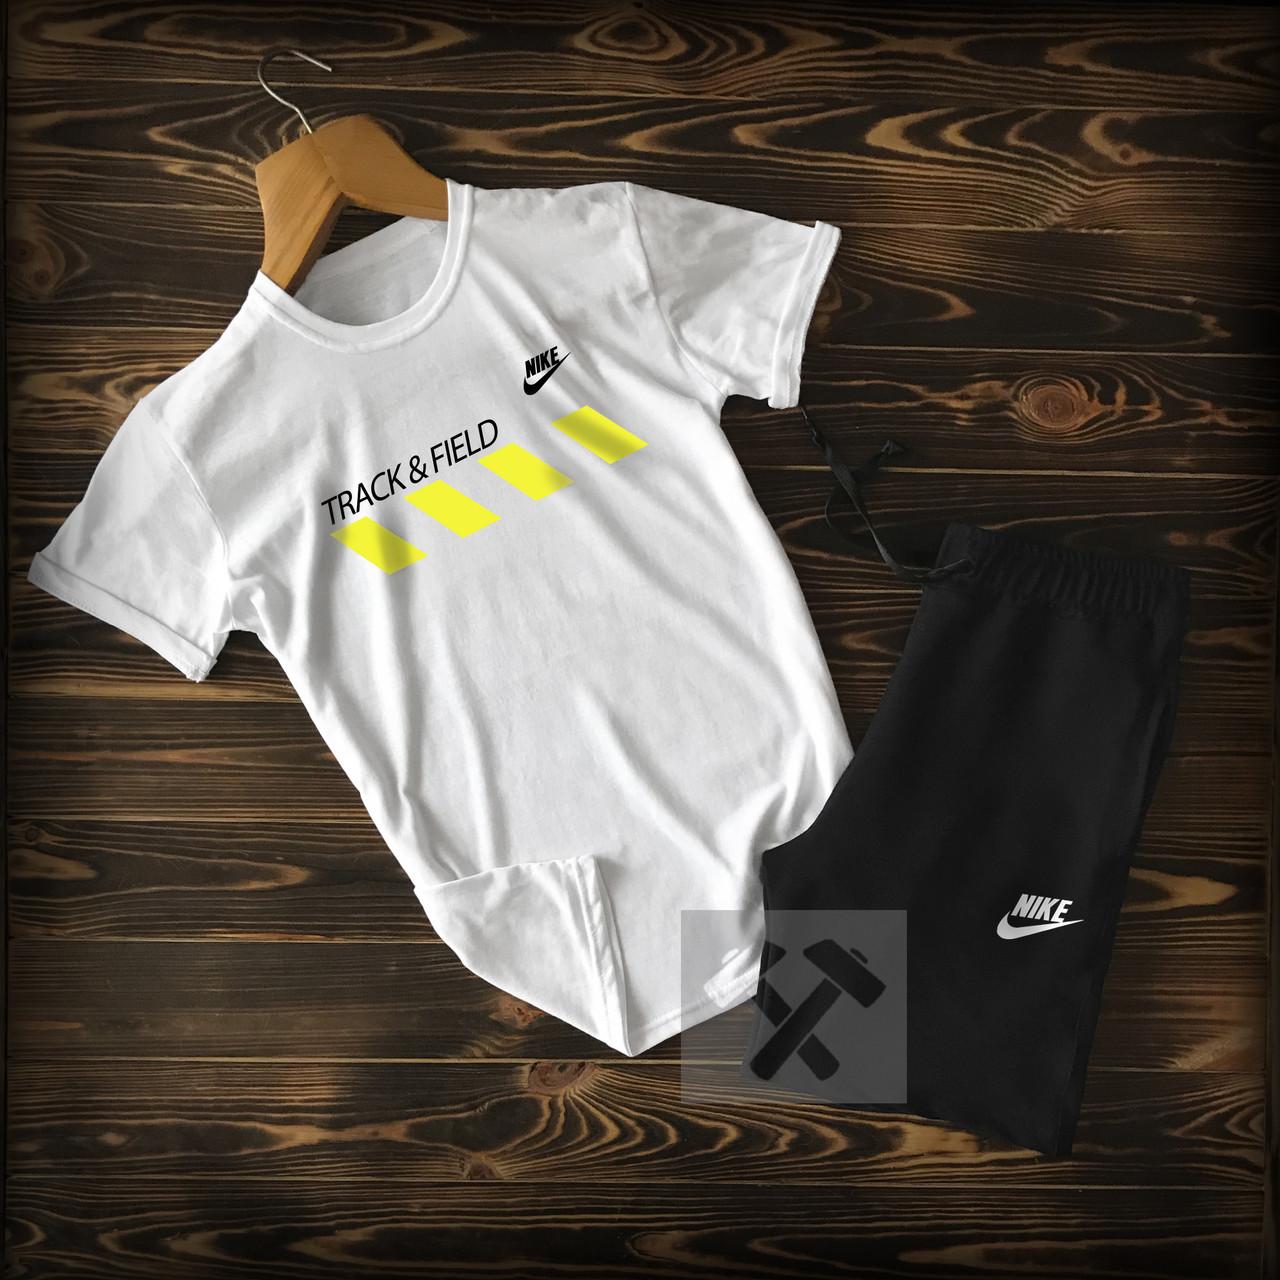 b5347535 Спортивный костюм футболка + шорты Nike Track Field черно-белого цвета -  Интернет магазин обуви